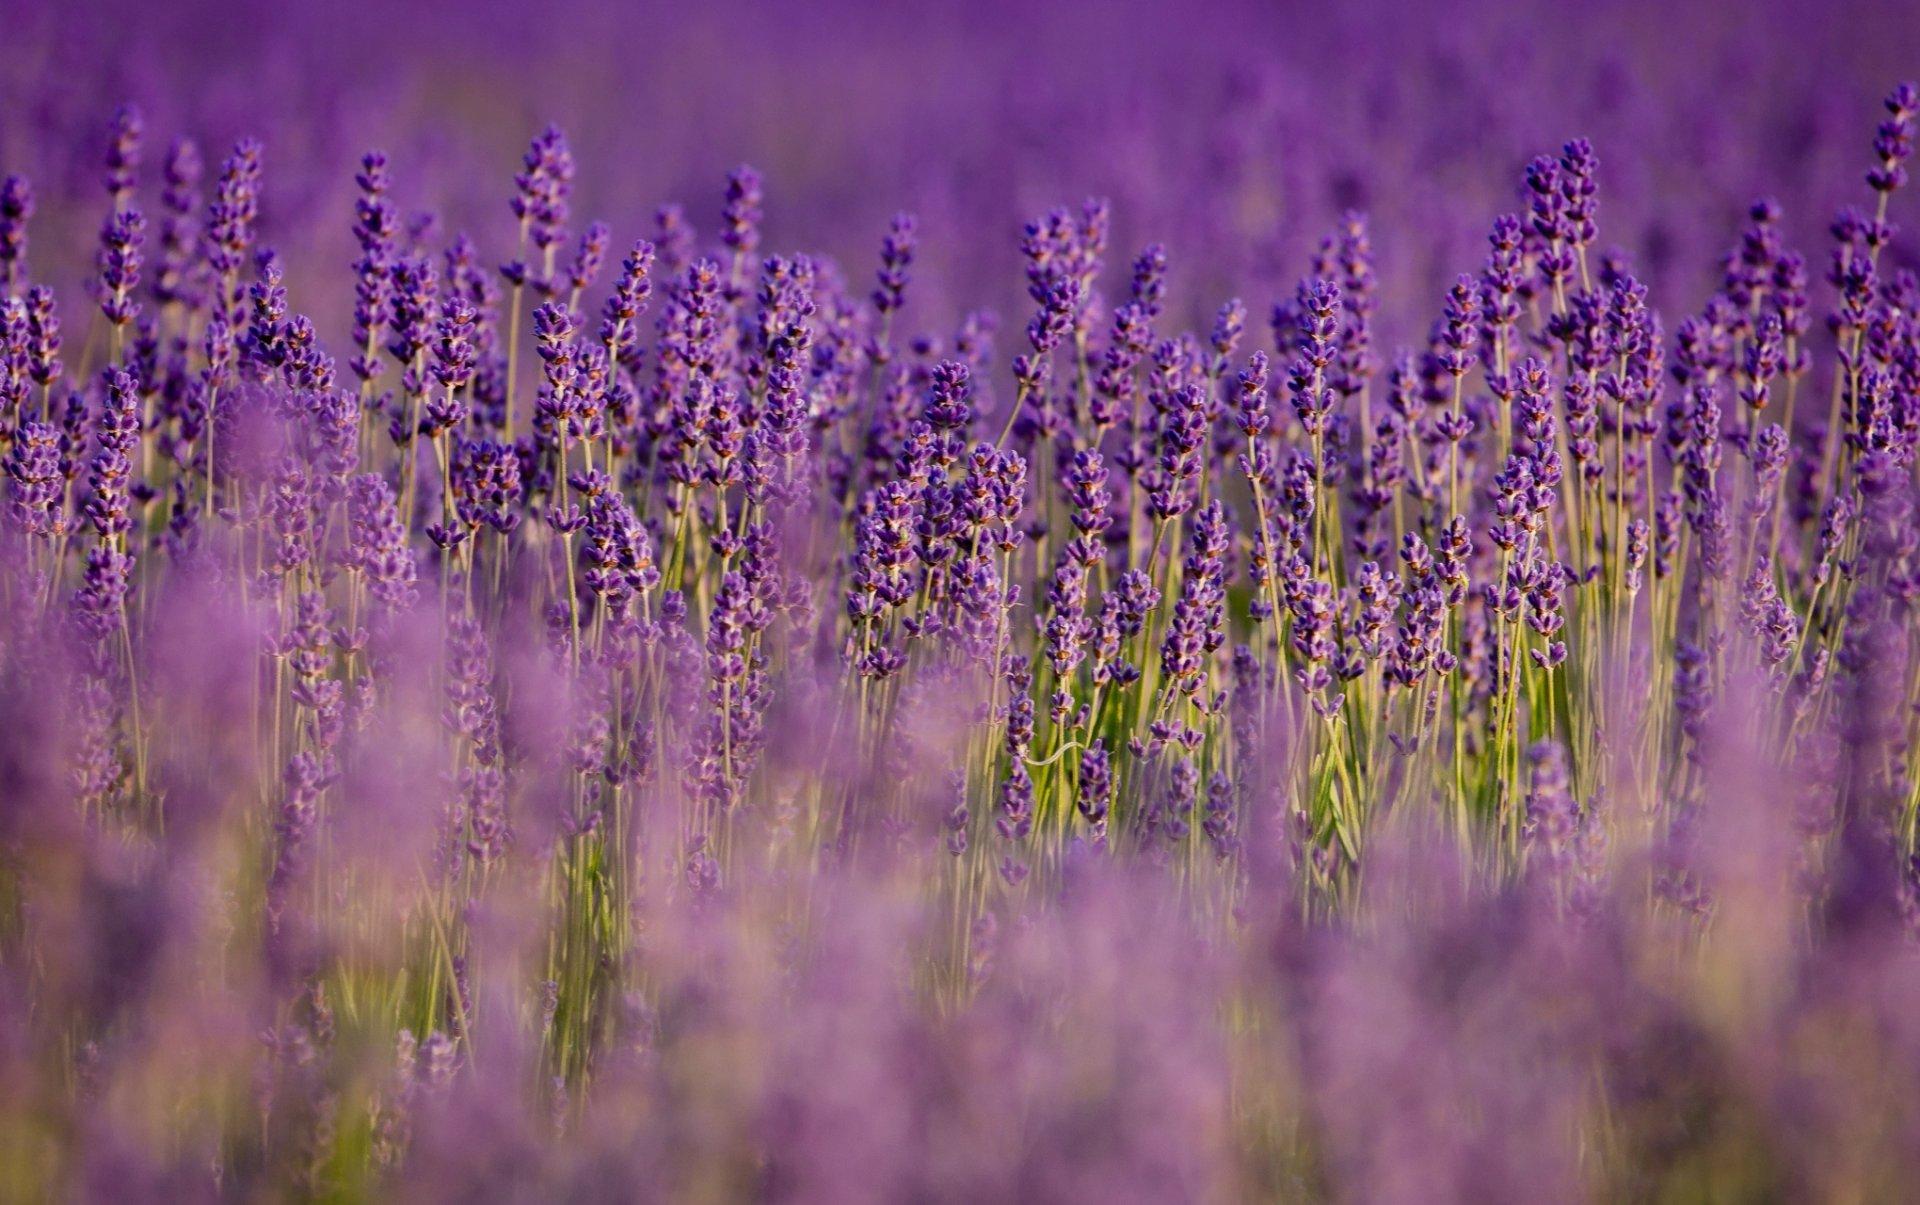 lavender background wallpaper - HD1920×1205